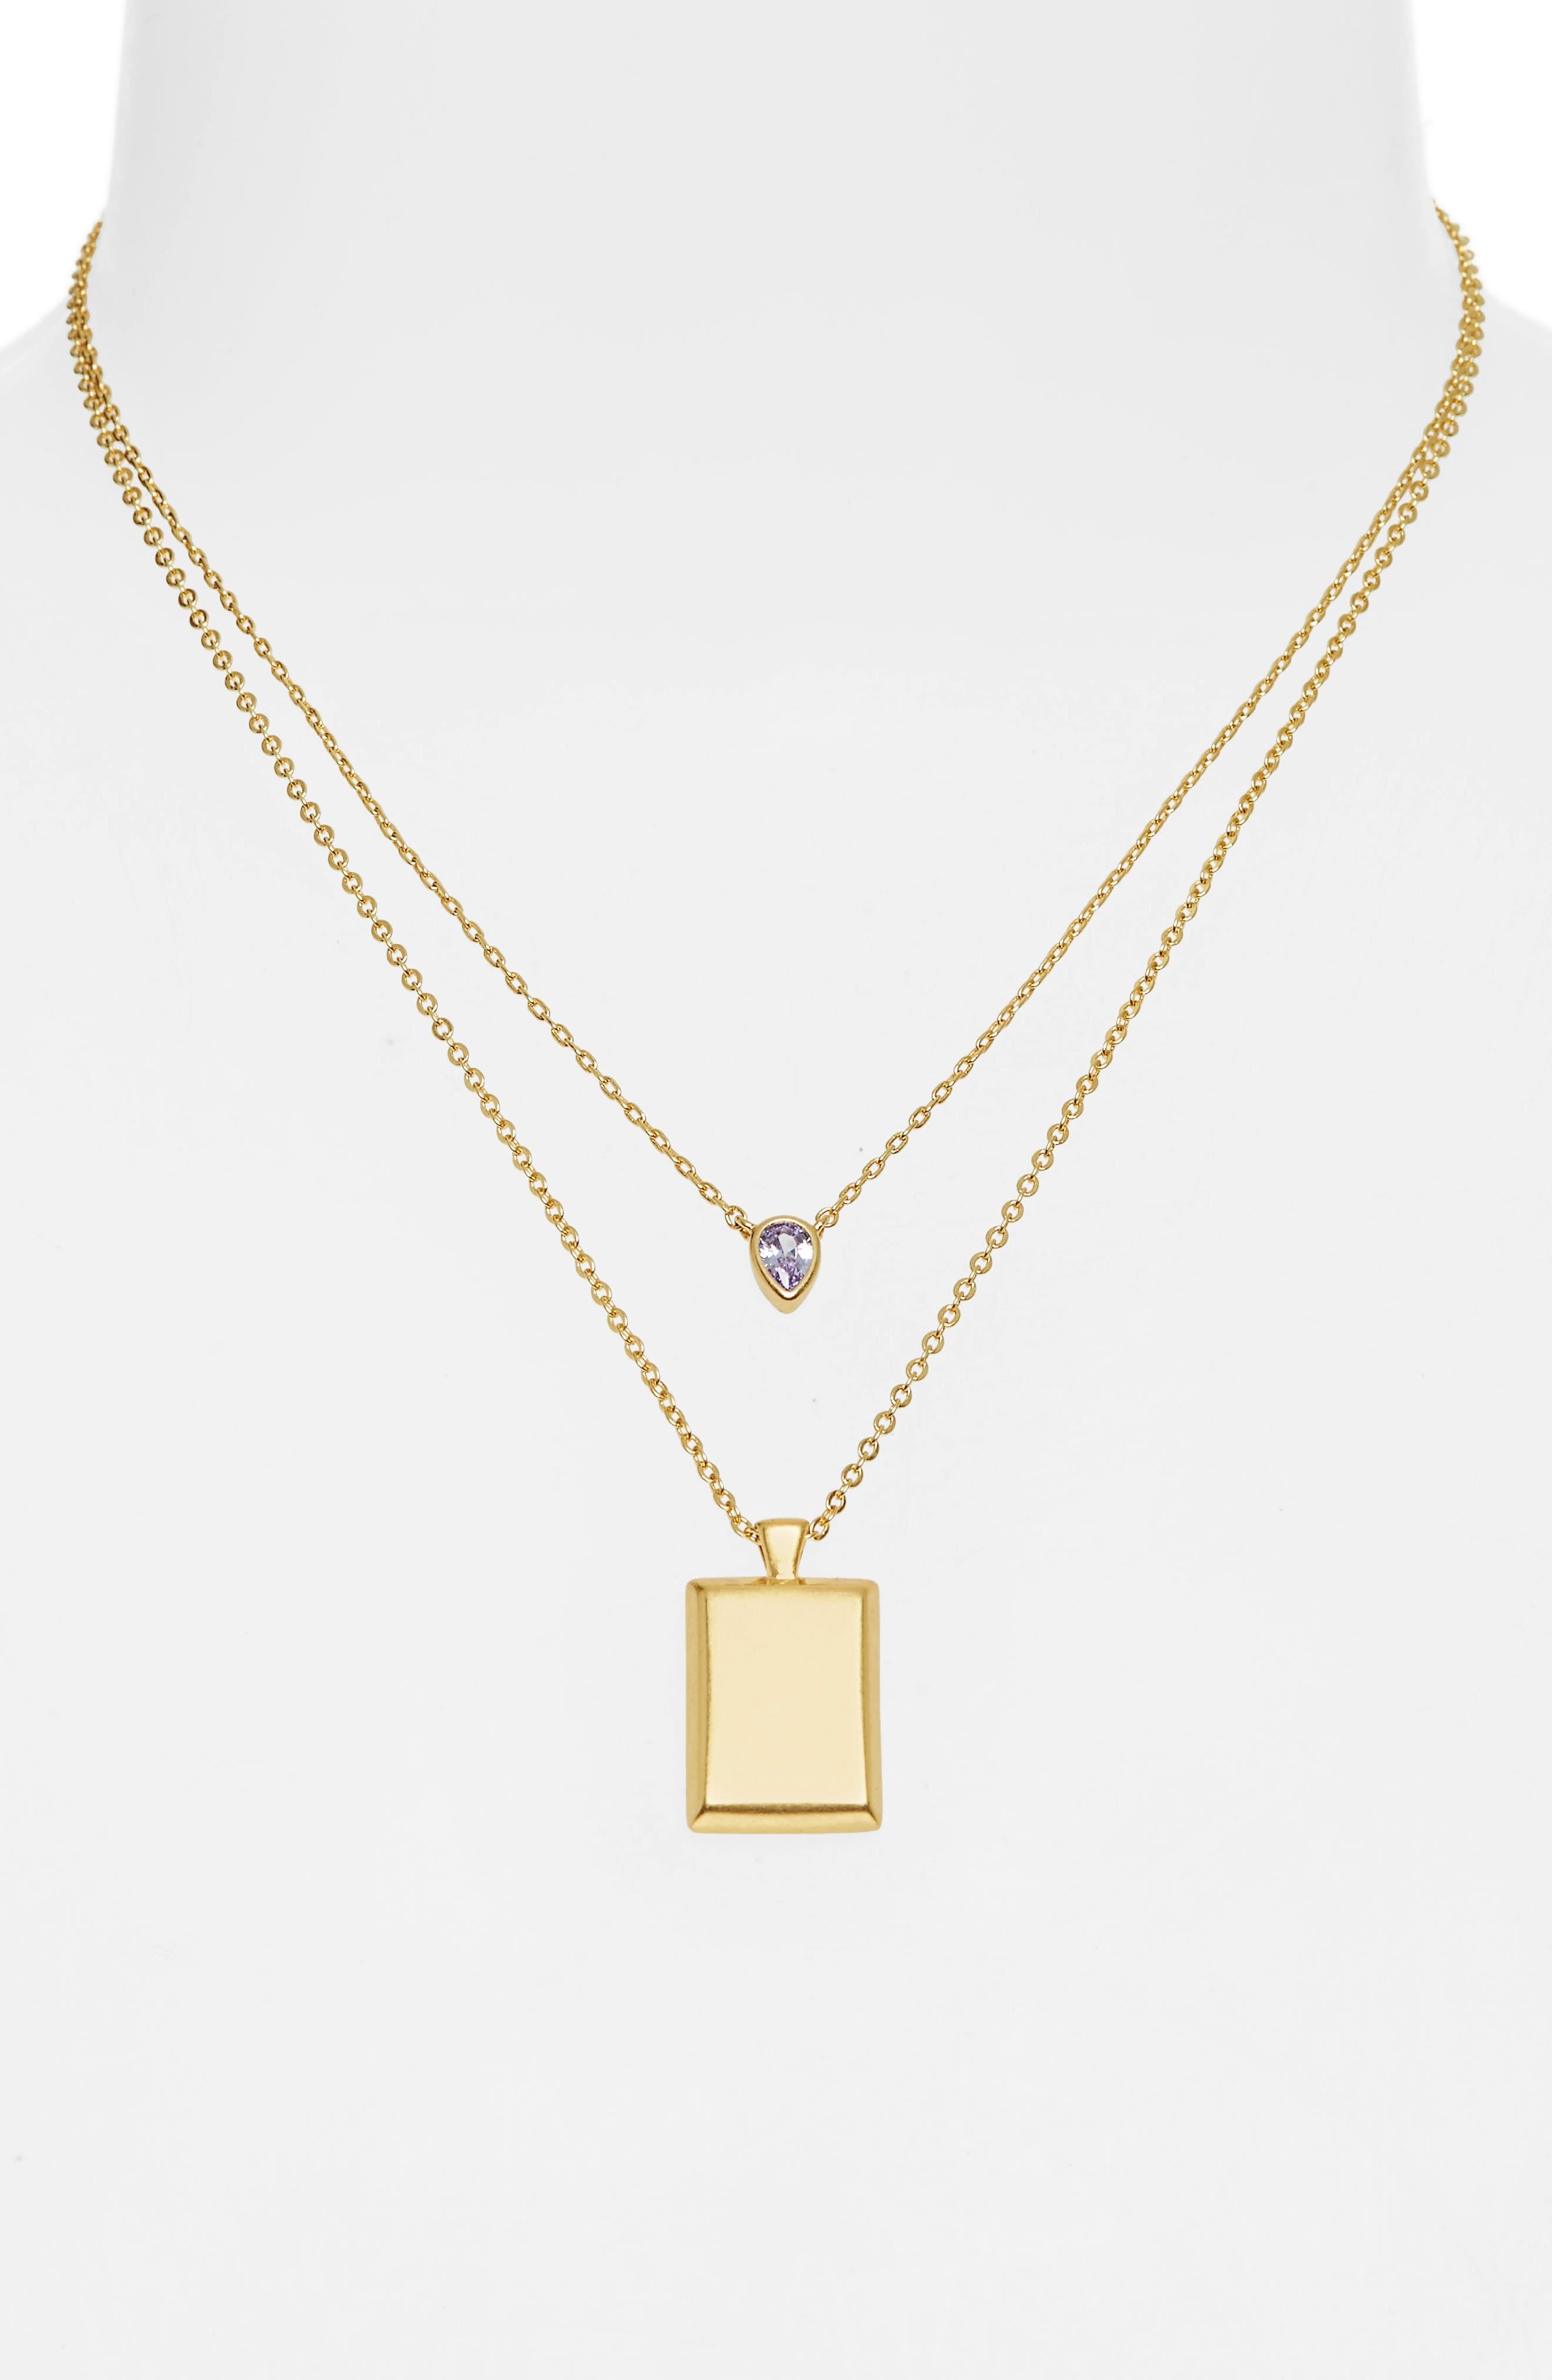 MADEWELL, Set of 2 Teardrop Pendant Necklaces, Alternate thumbnail 2, color, VINTAGE GOLD